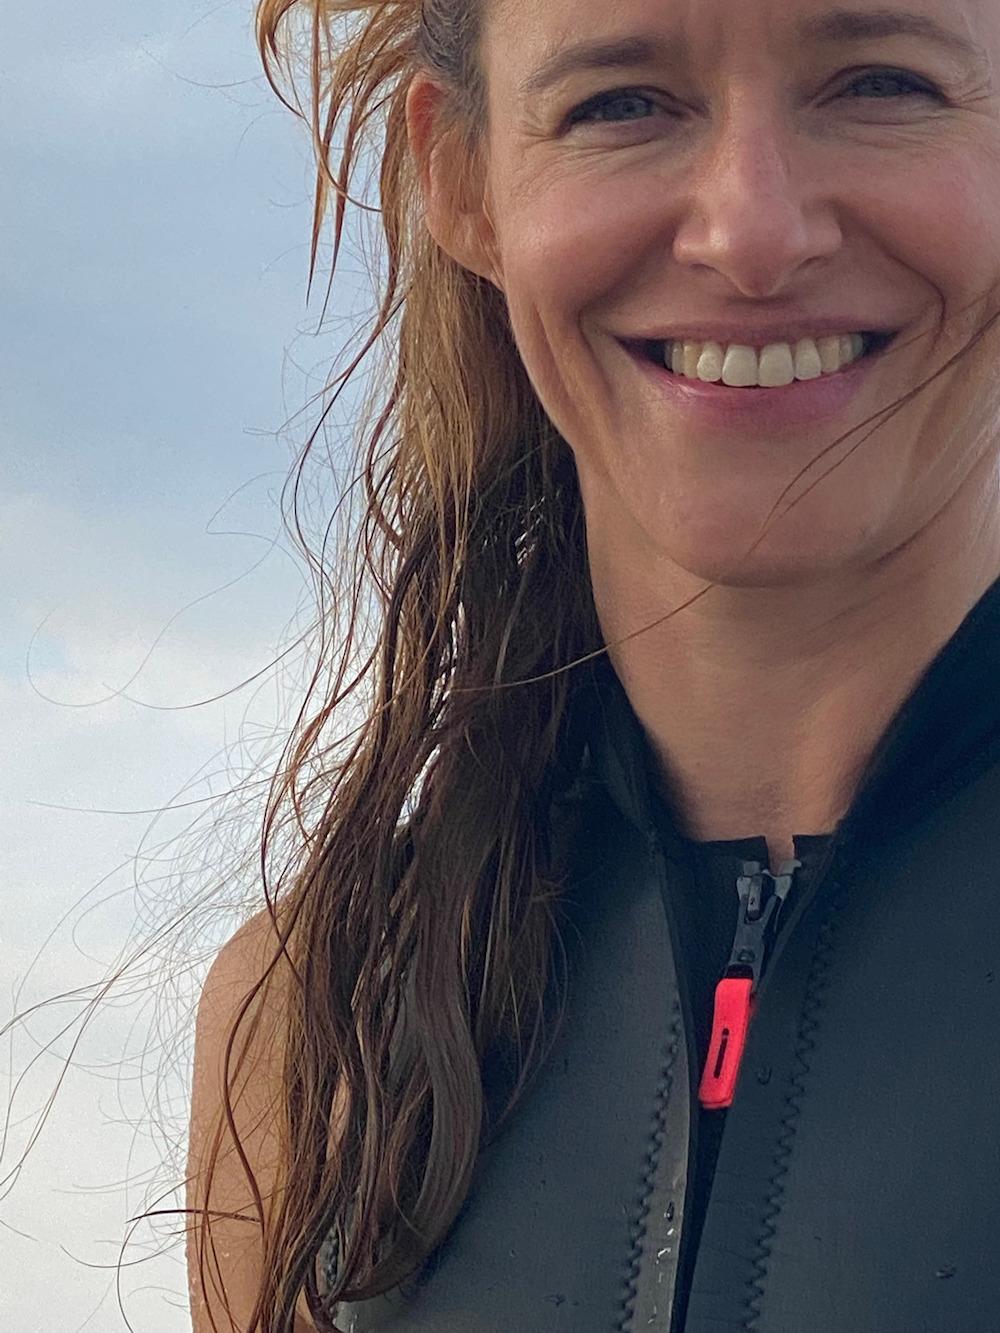 Kintana Wet Suit Modepilot Kathrin Bierling